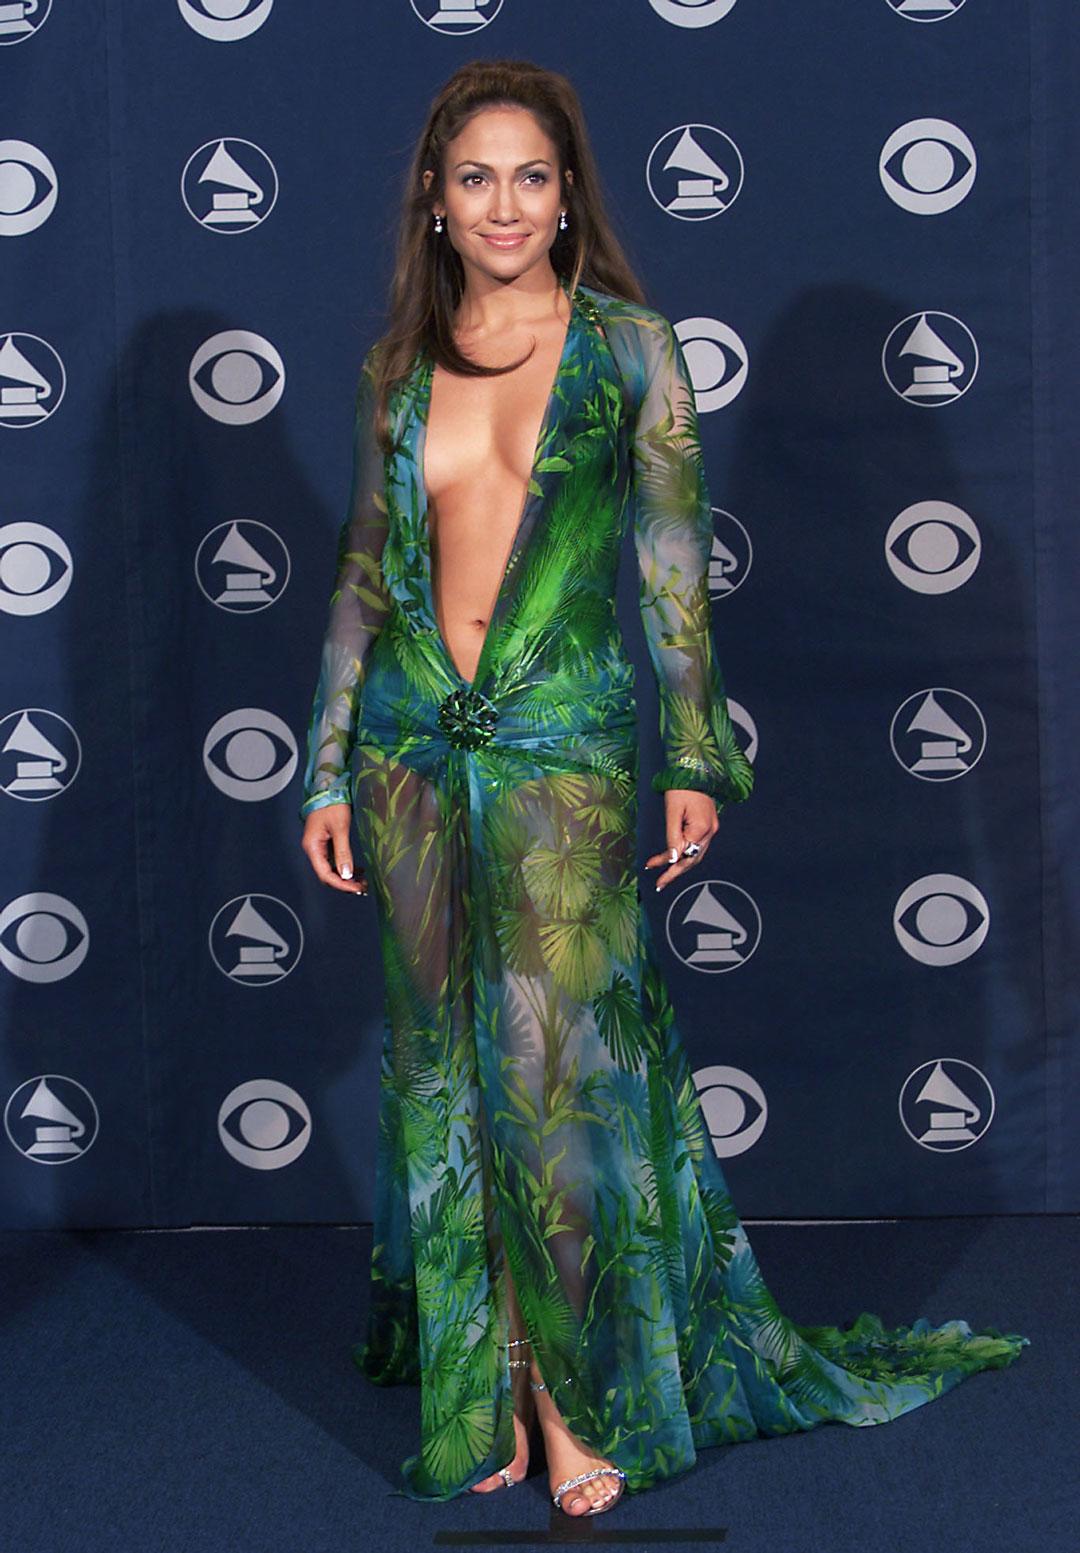 http://4.bp.blogspot.com/-60sHgetbhjQ/URgExWfrrPI/AAAAAAAAES0/61o0FV2dcrM/s1600/JLO+Grammys.jpg